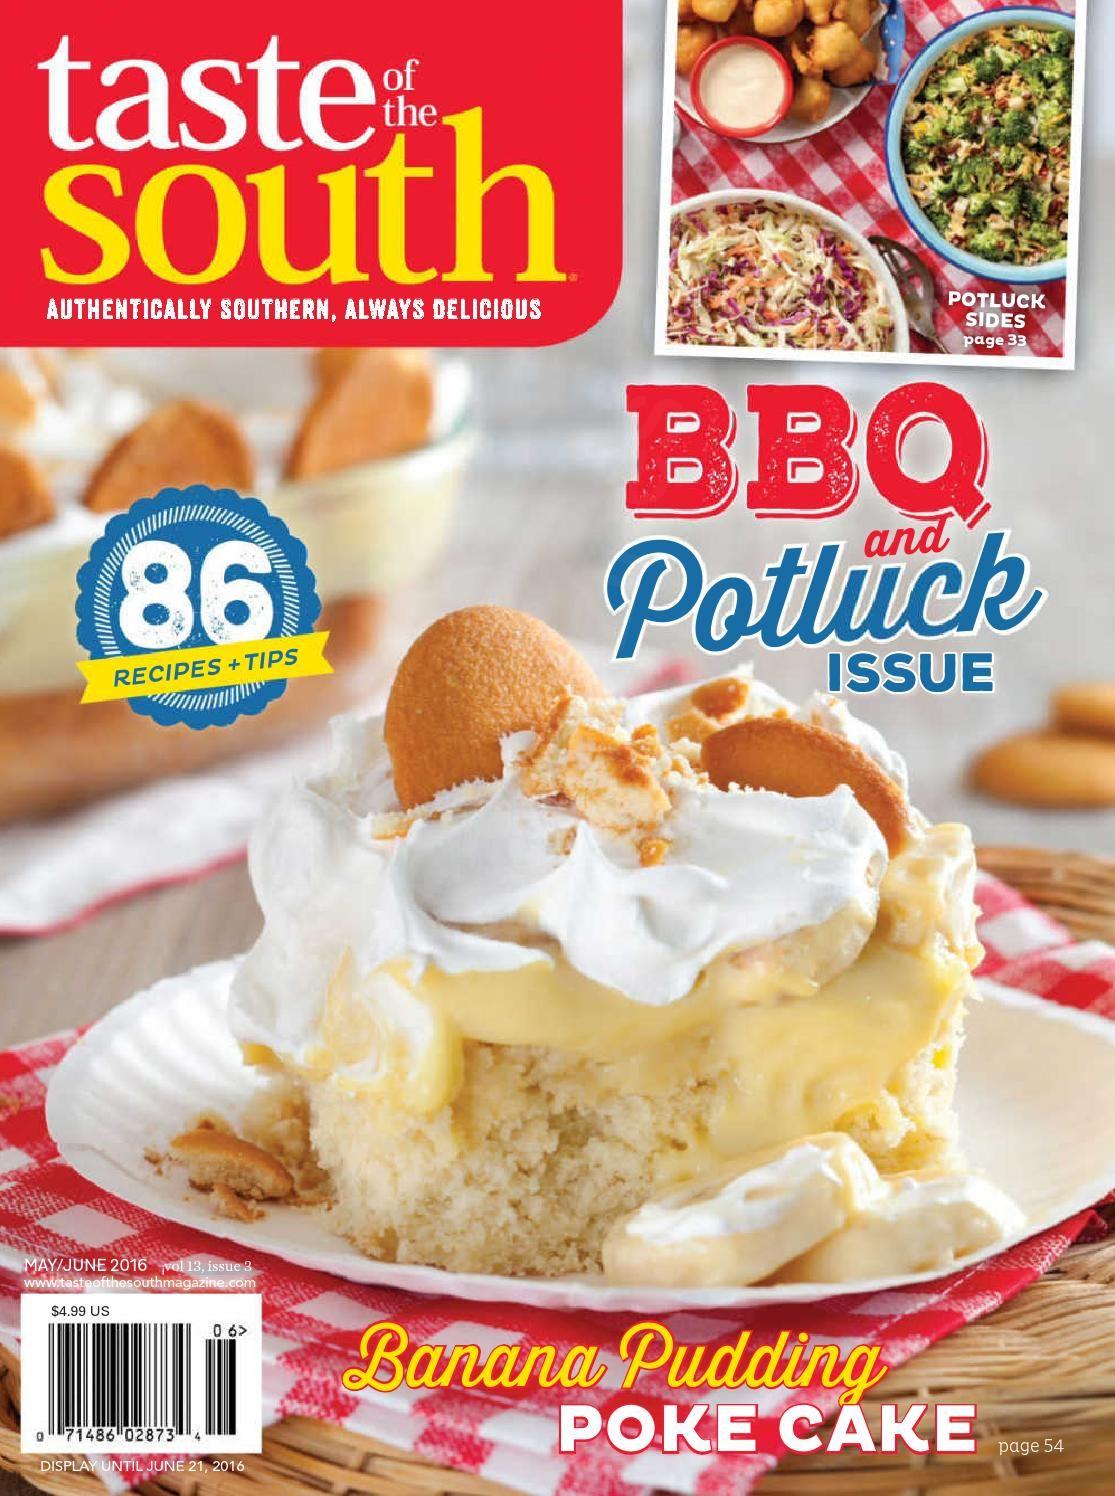 Taste of the south june 2016 allmagazines digital magazine taste of the south june 2016 allmagazines digital magazine download pdf forumfinder Choice Image